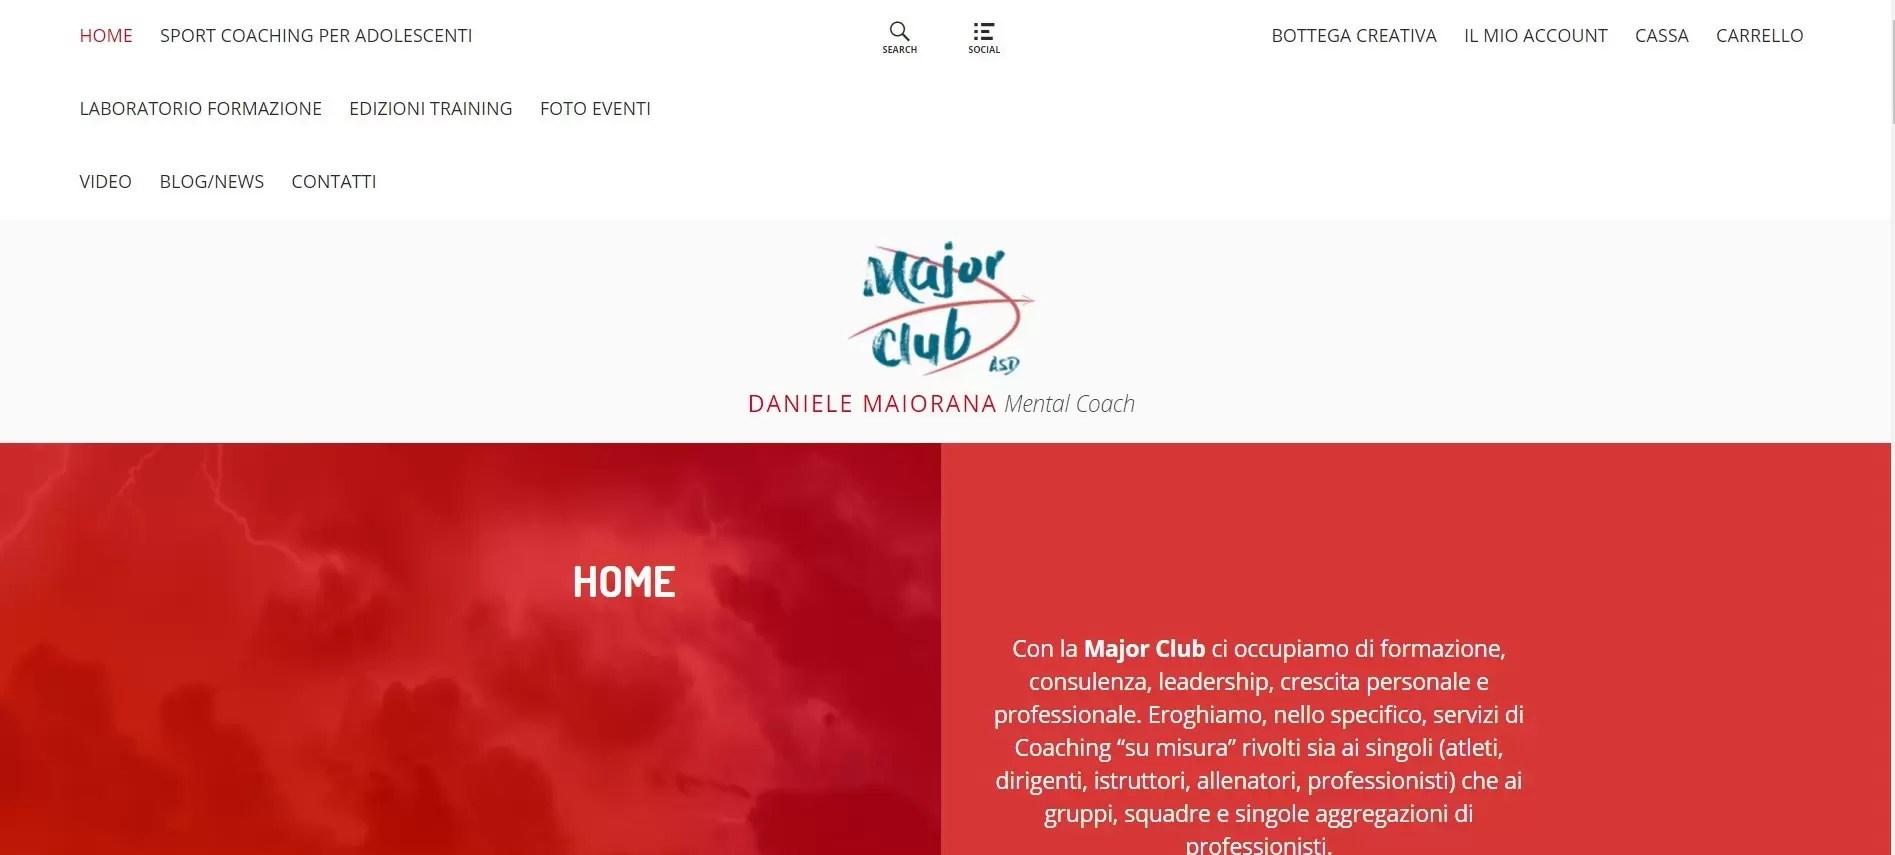 Daniele Maiorana Mental Coach